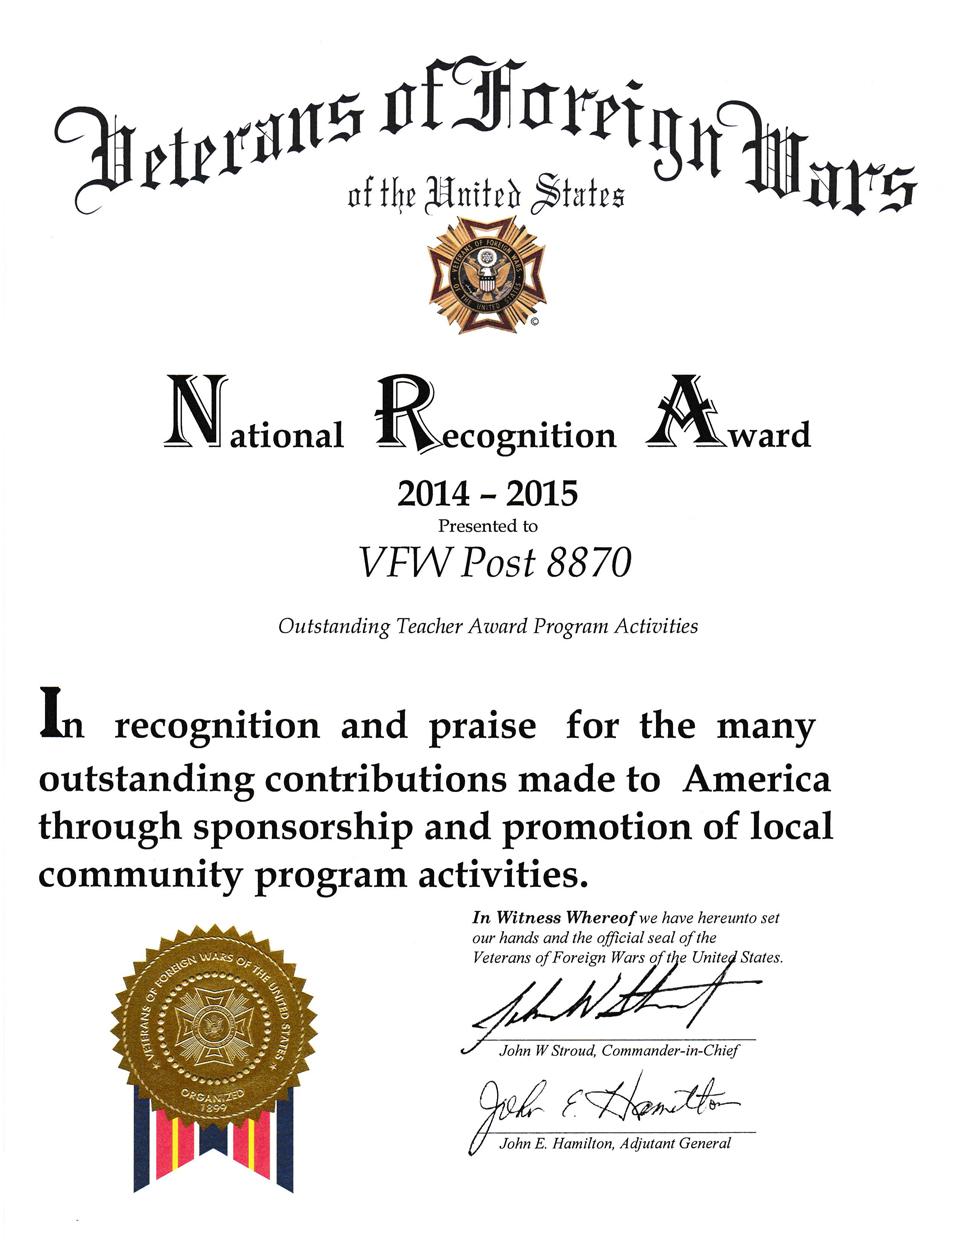 National Recognition Award 2014-2015 Outstanding Teacher Award Program Activities